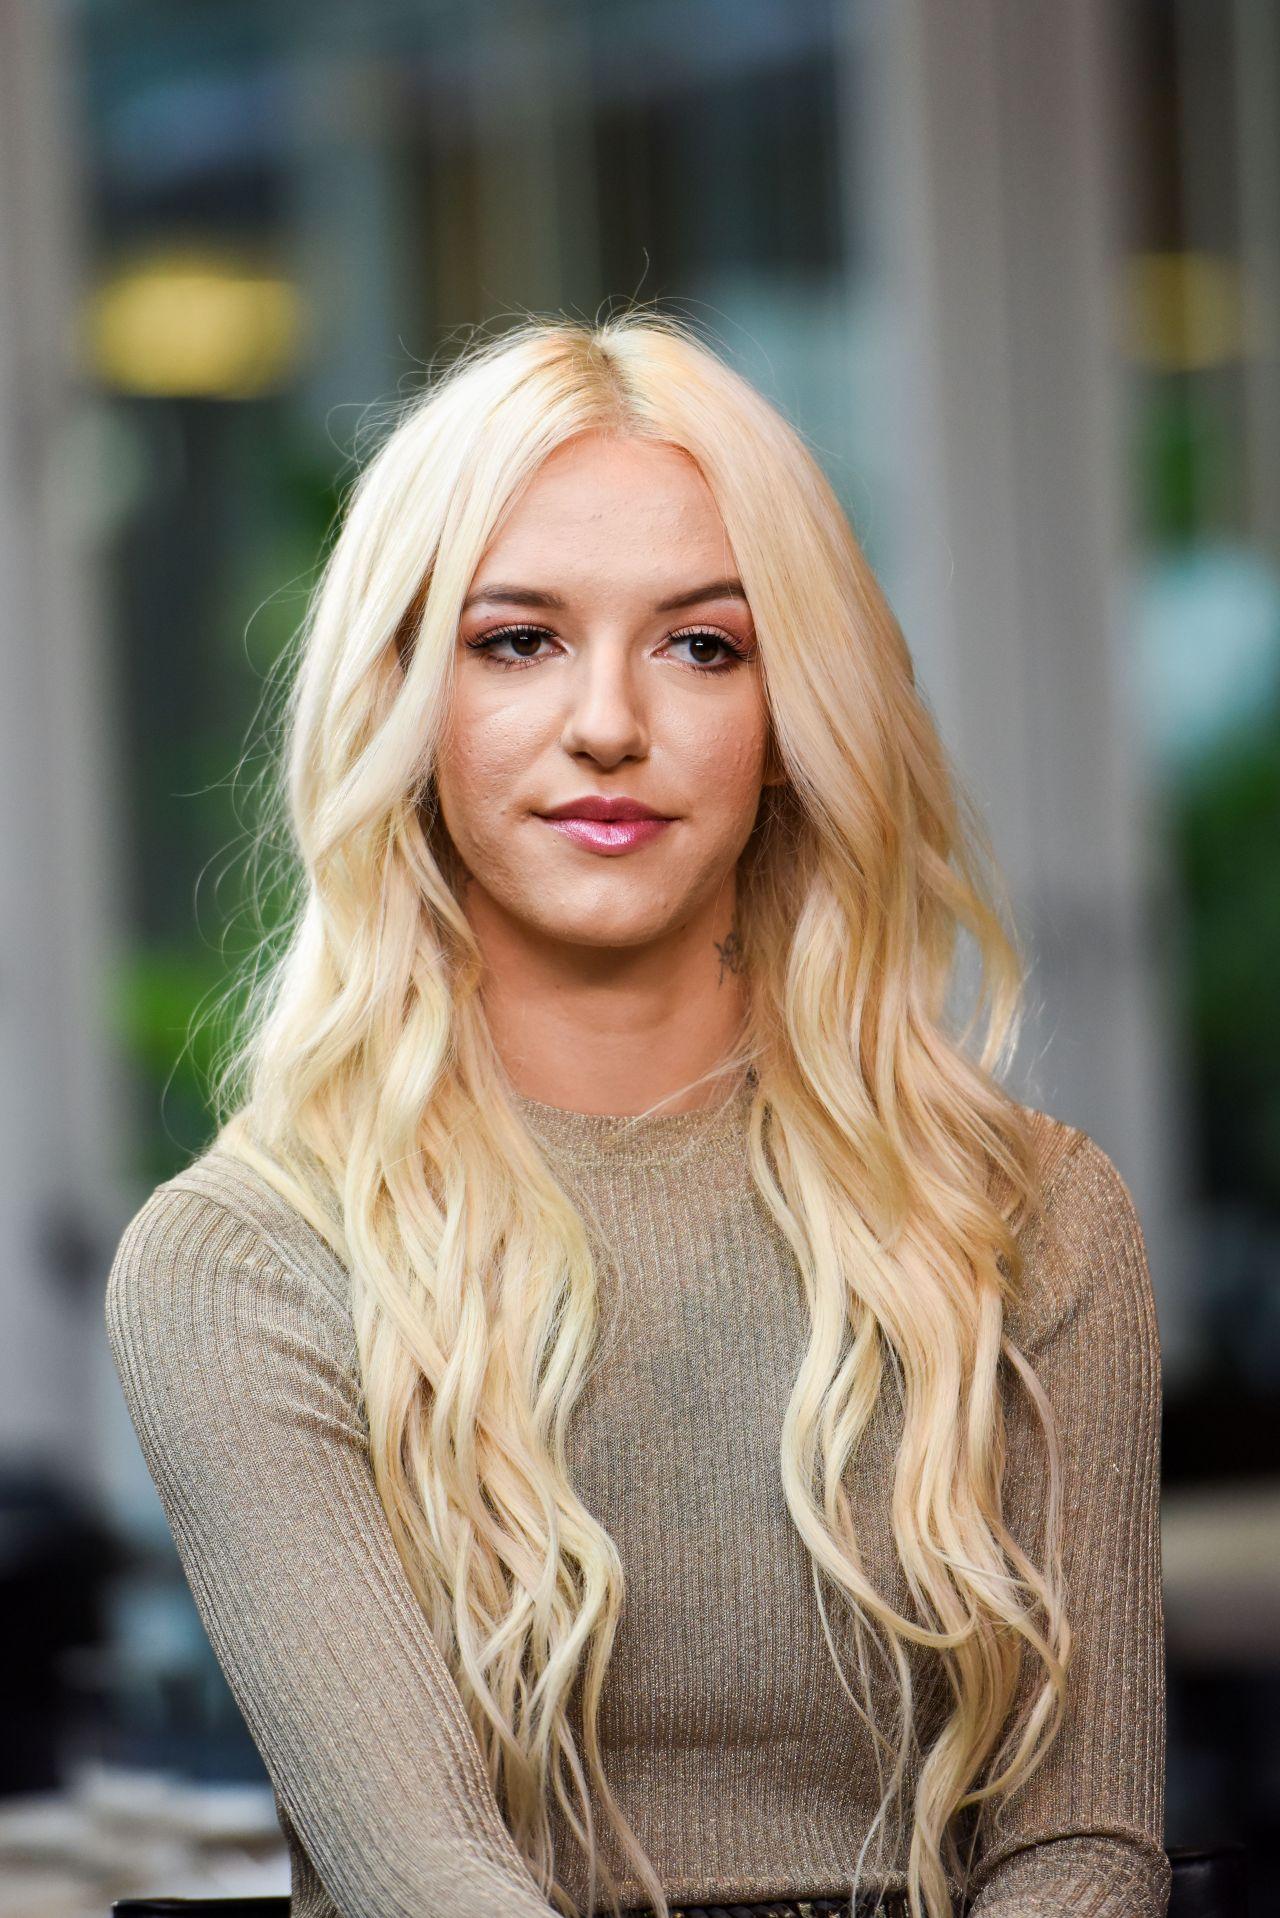 Bria Vinaite Lithuanian  Actress